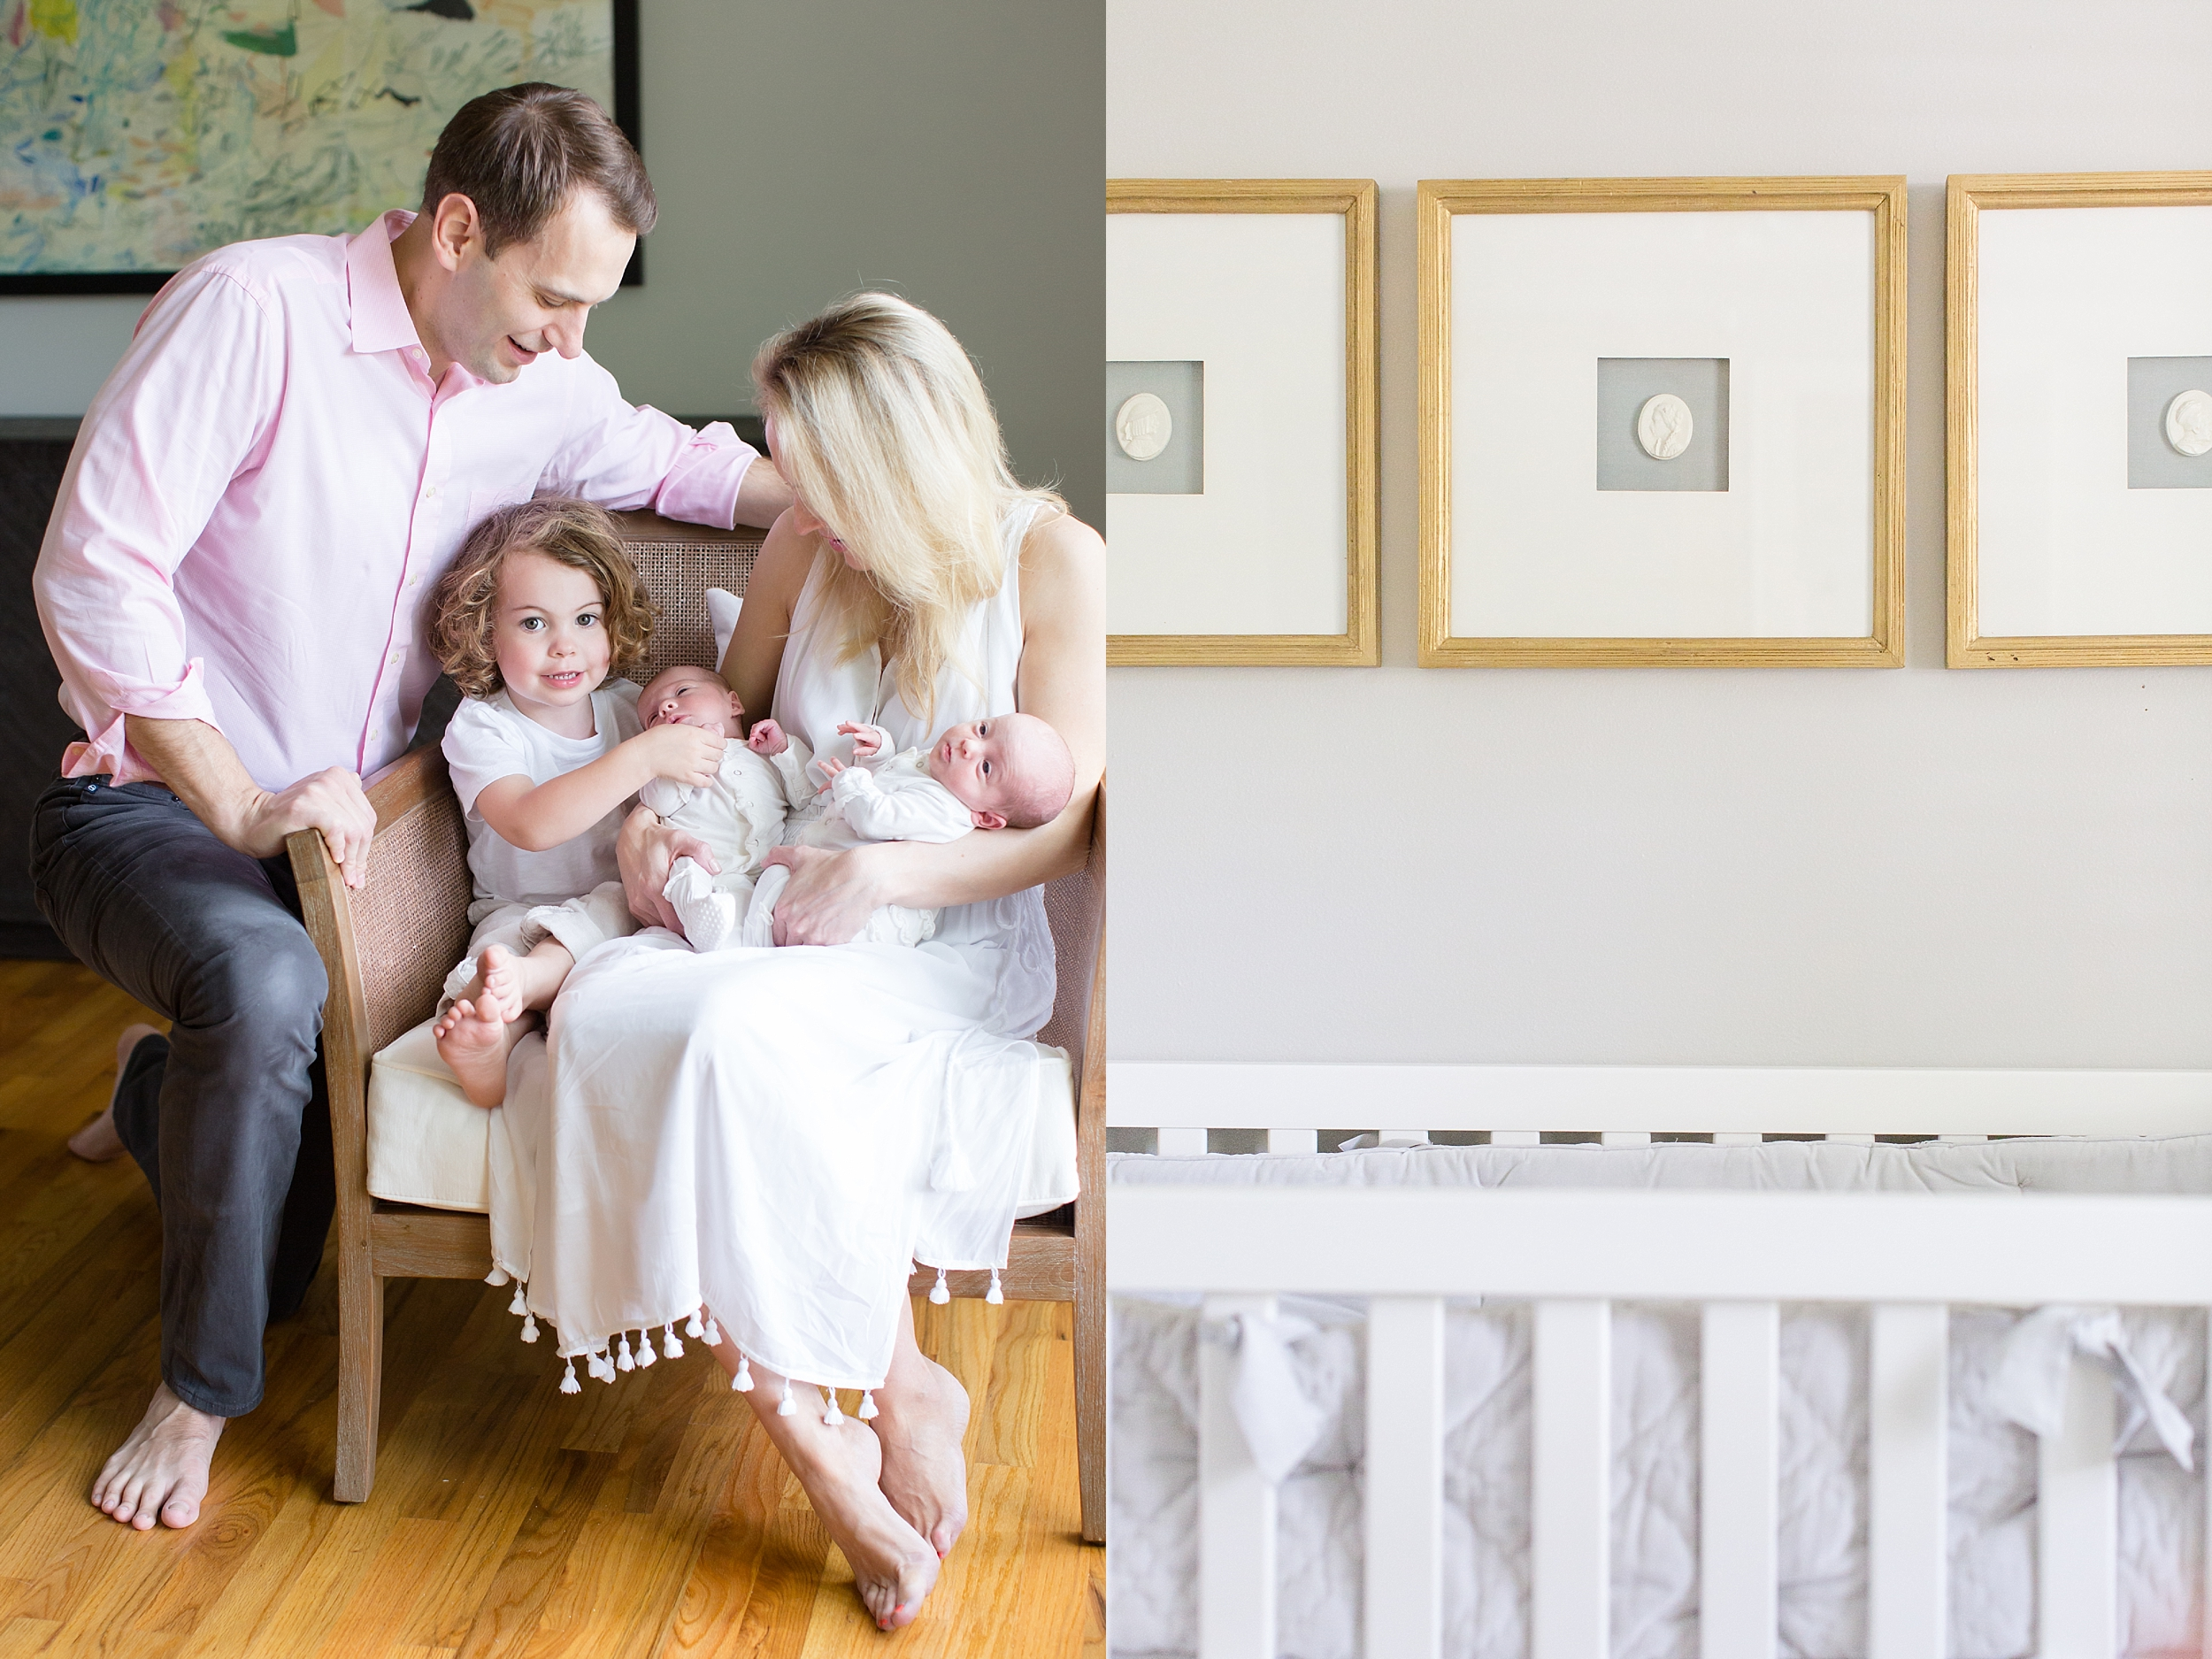 Landon-Schneider-Photography-Holt-Newborn-Session-Texas_0024.jpg